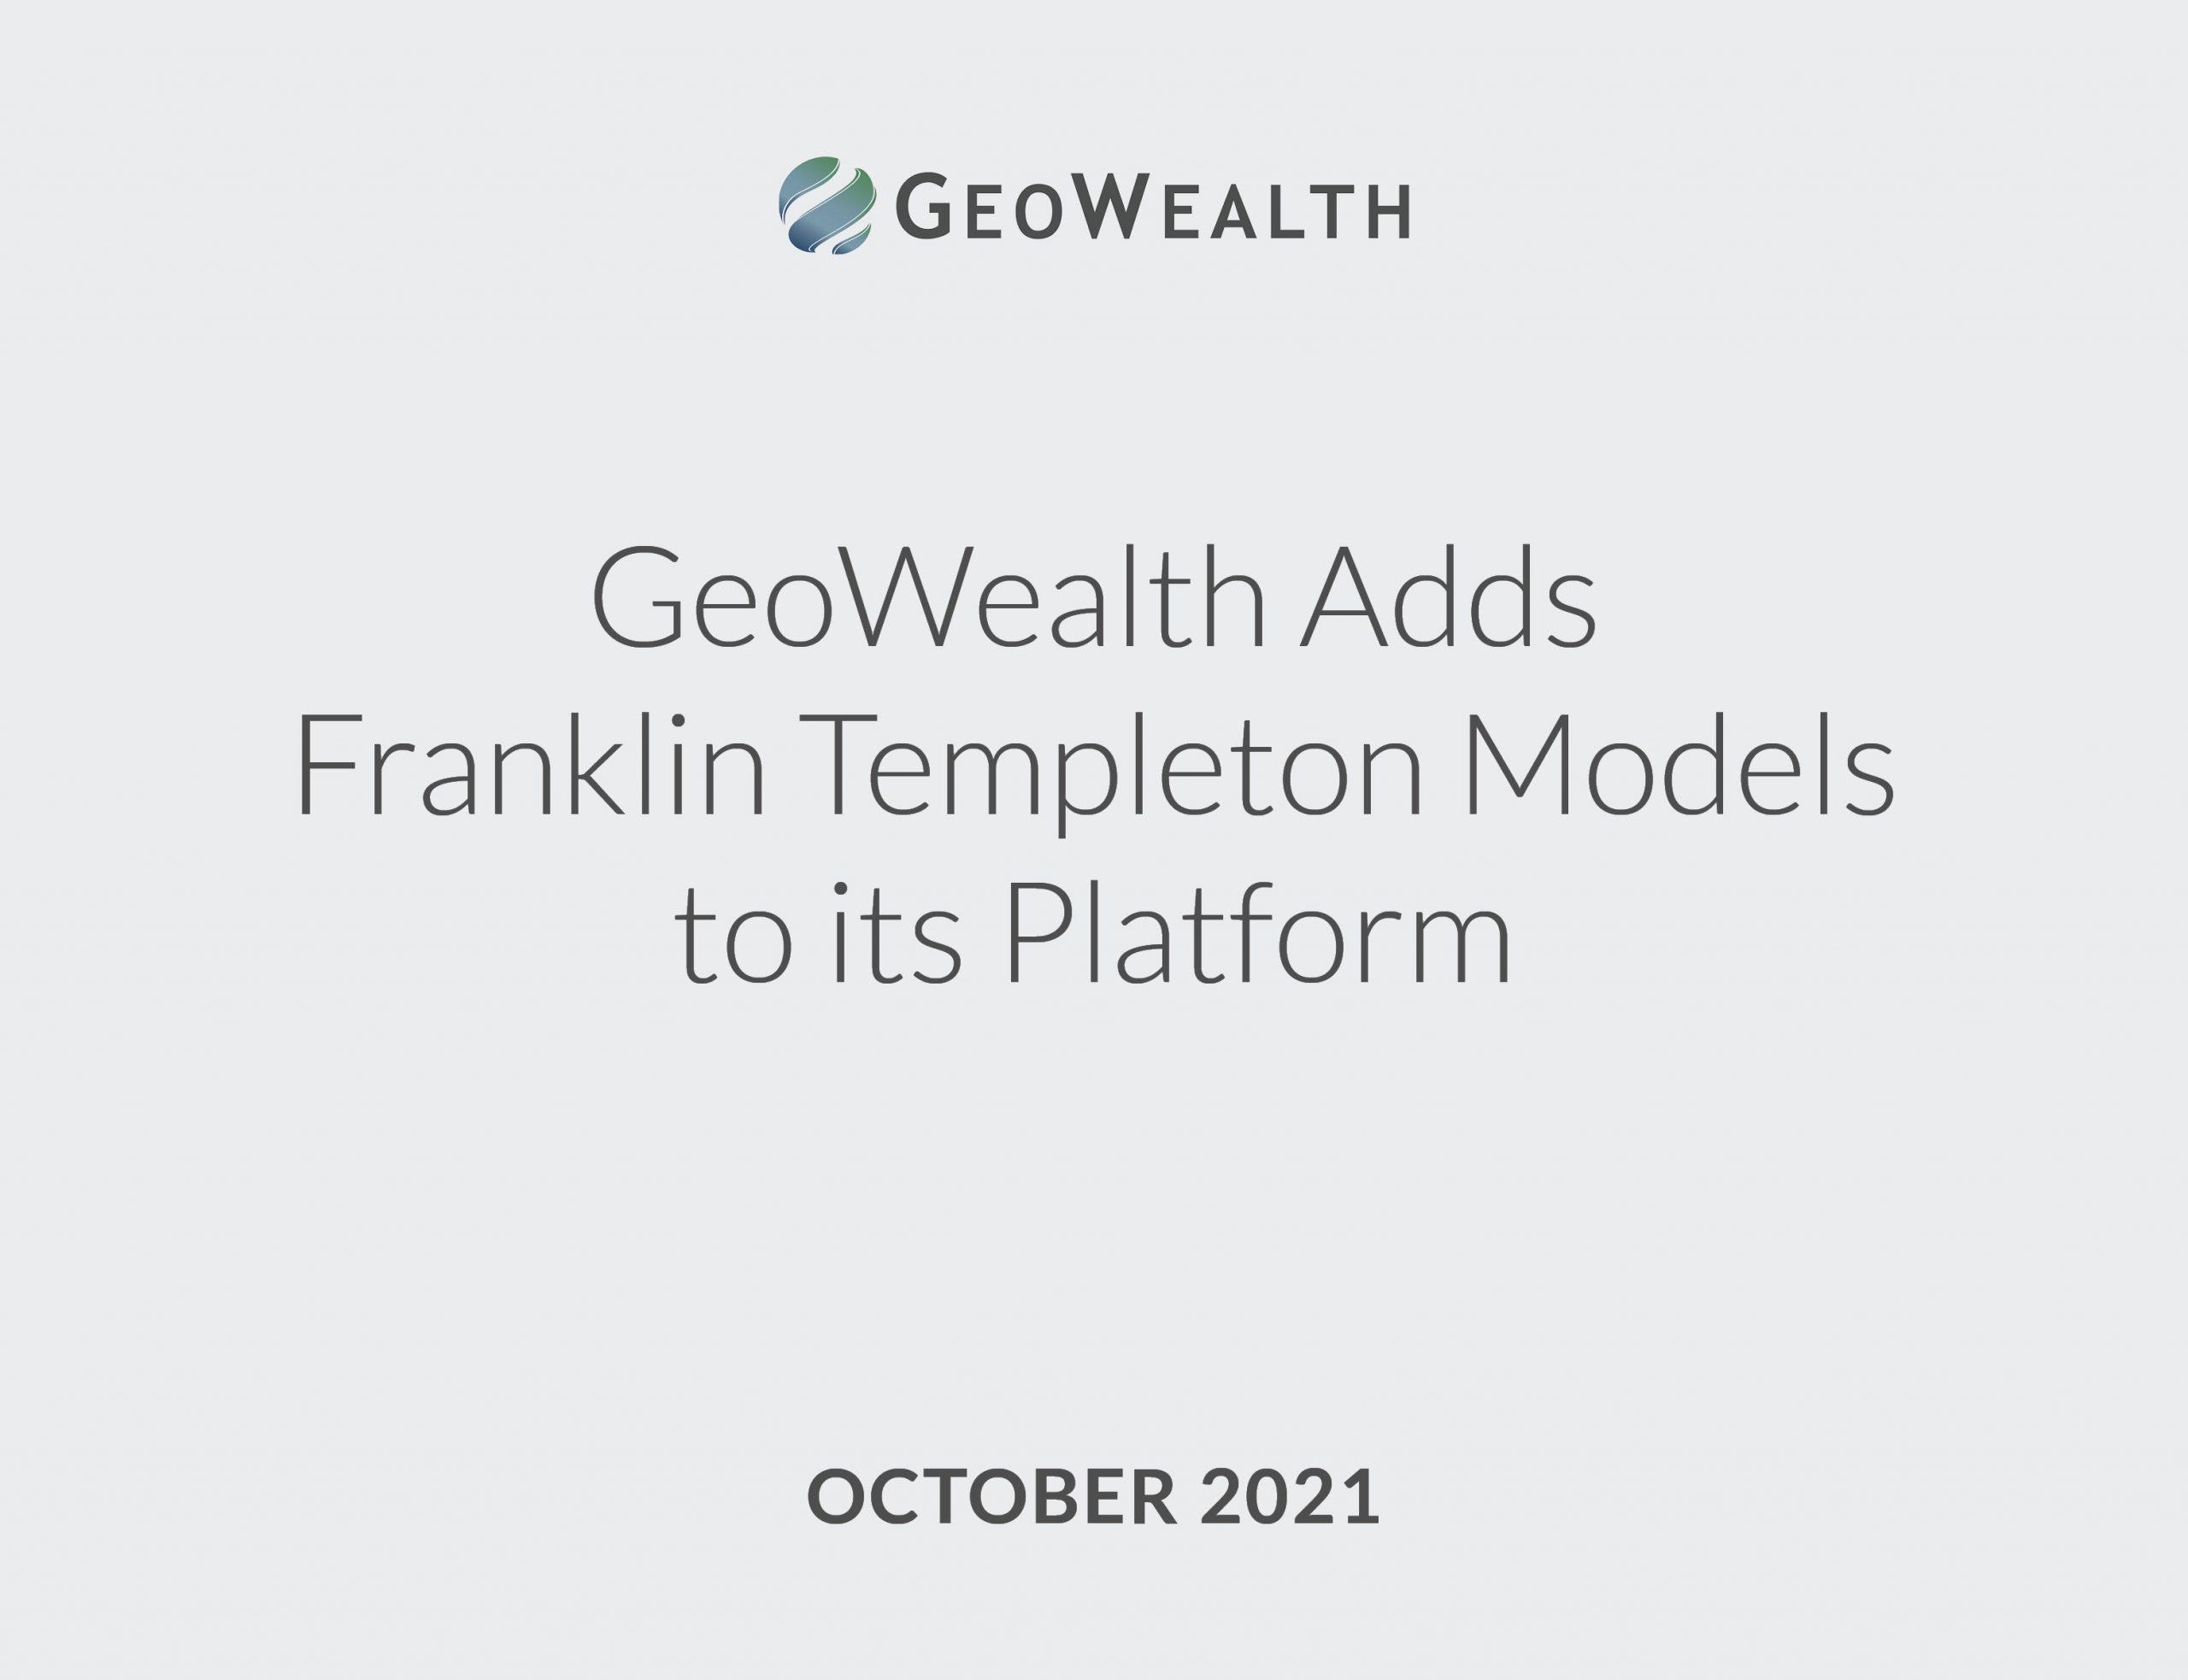 GeoWealth Franklin Templeton